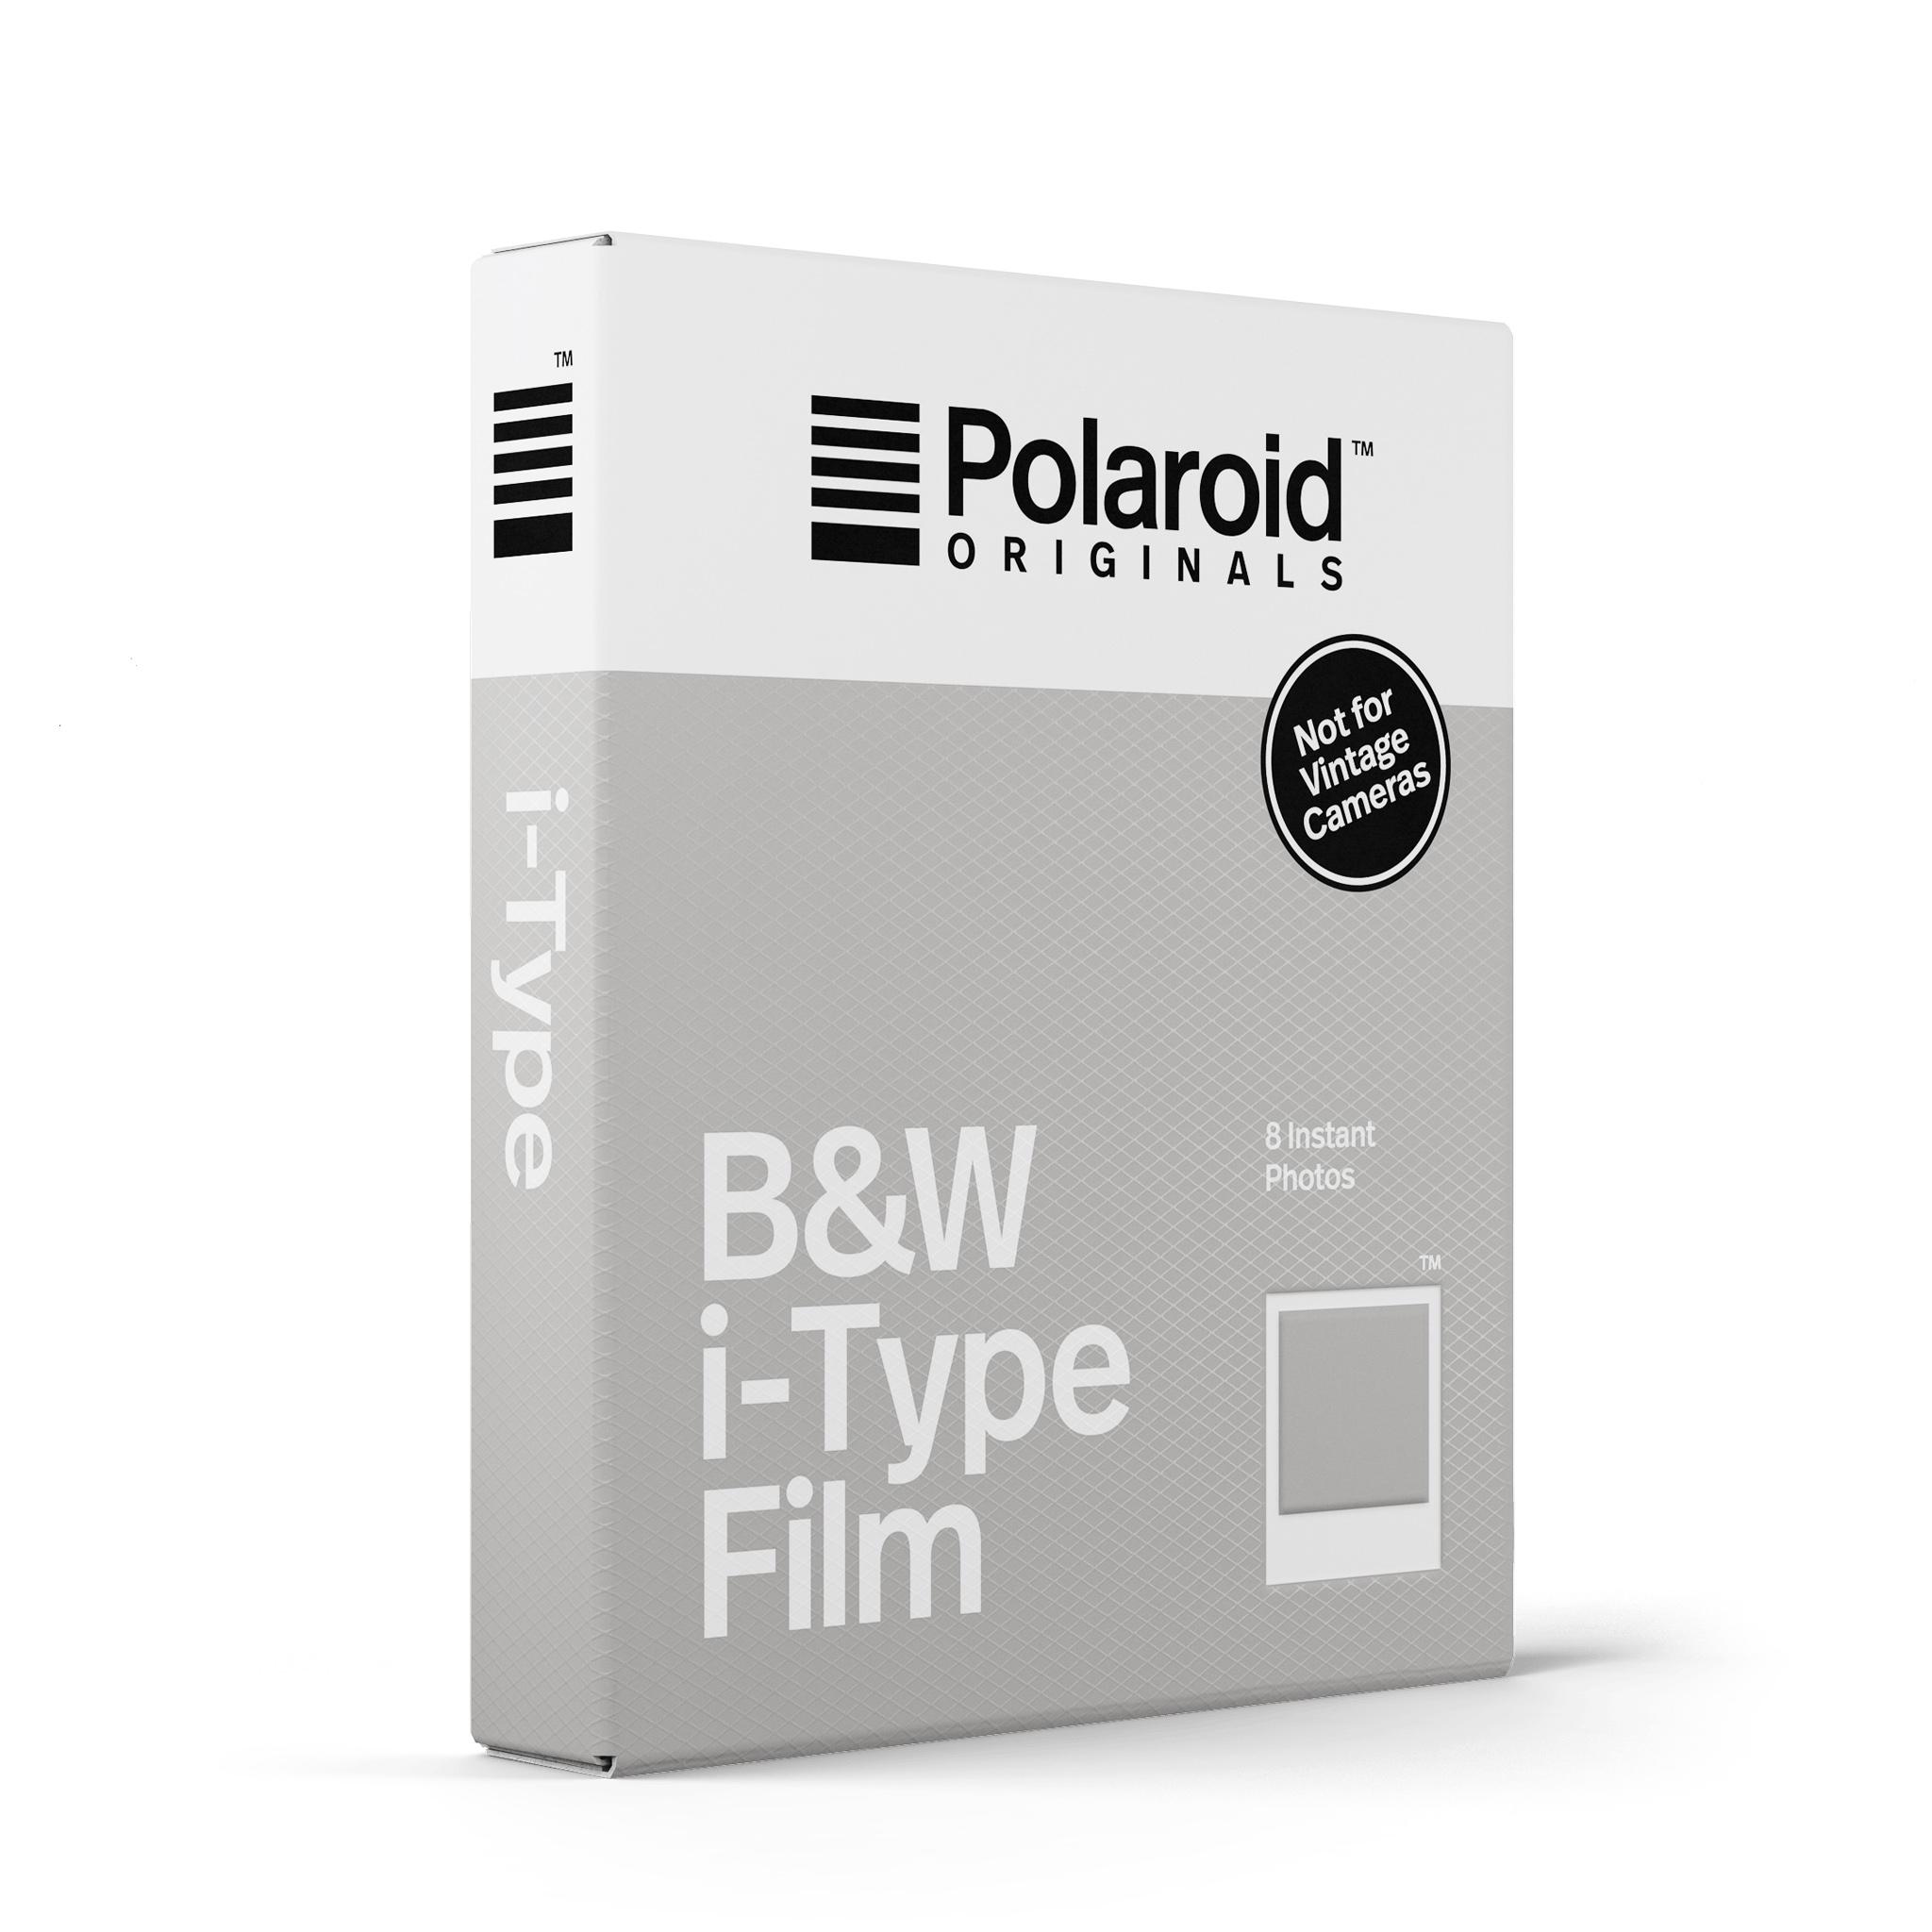 da95e0a910 The first Polaroid instant camera in a decade is adorable - The Verge